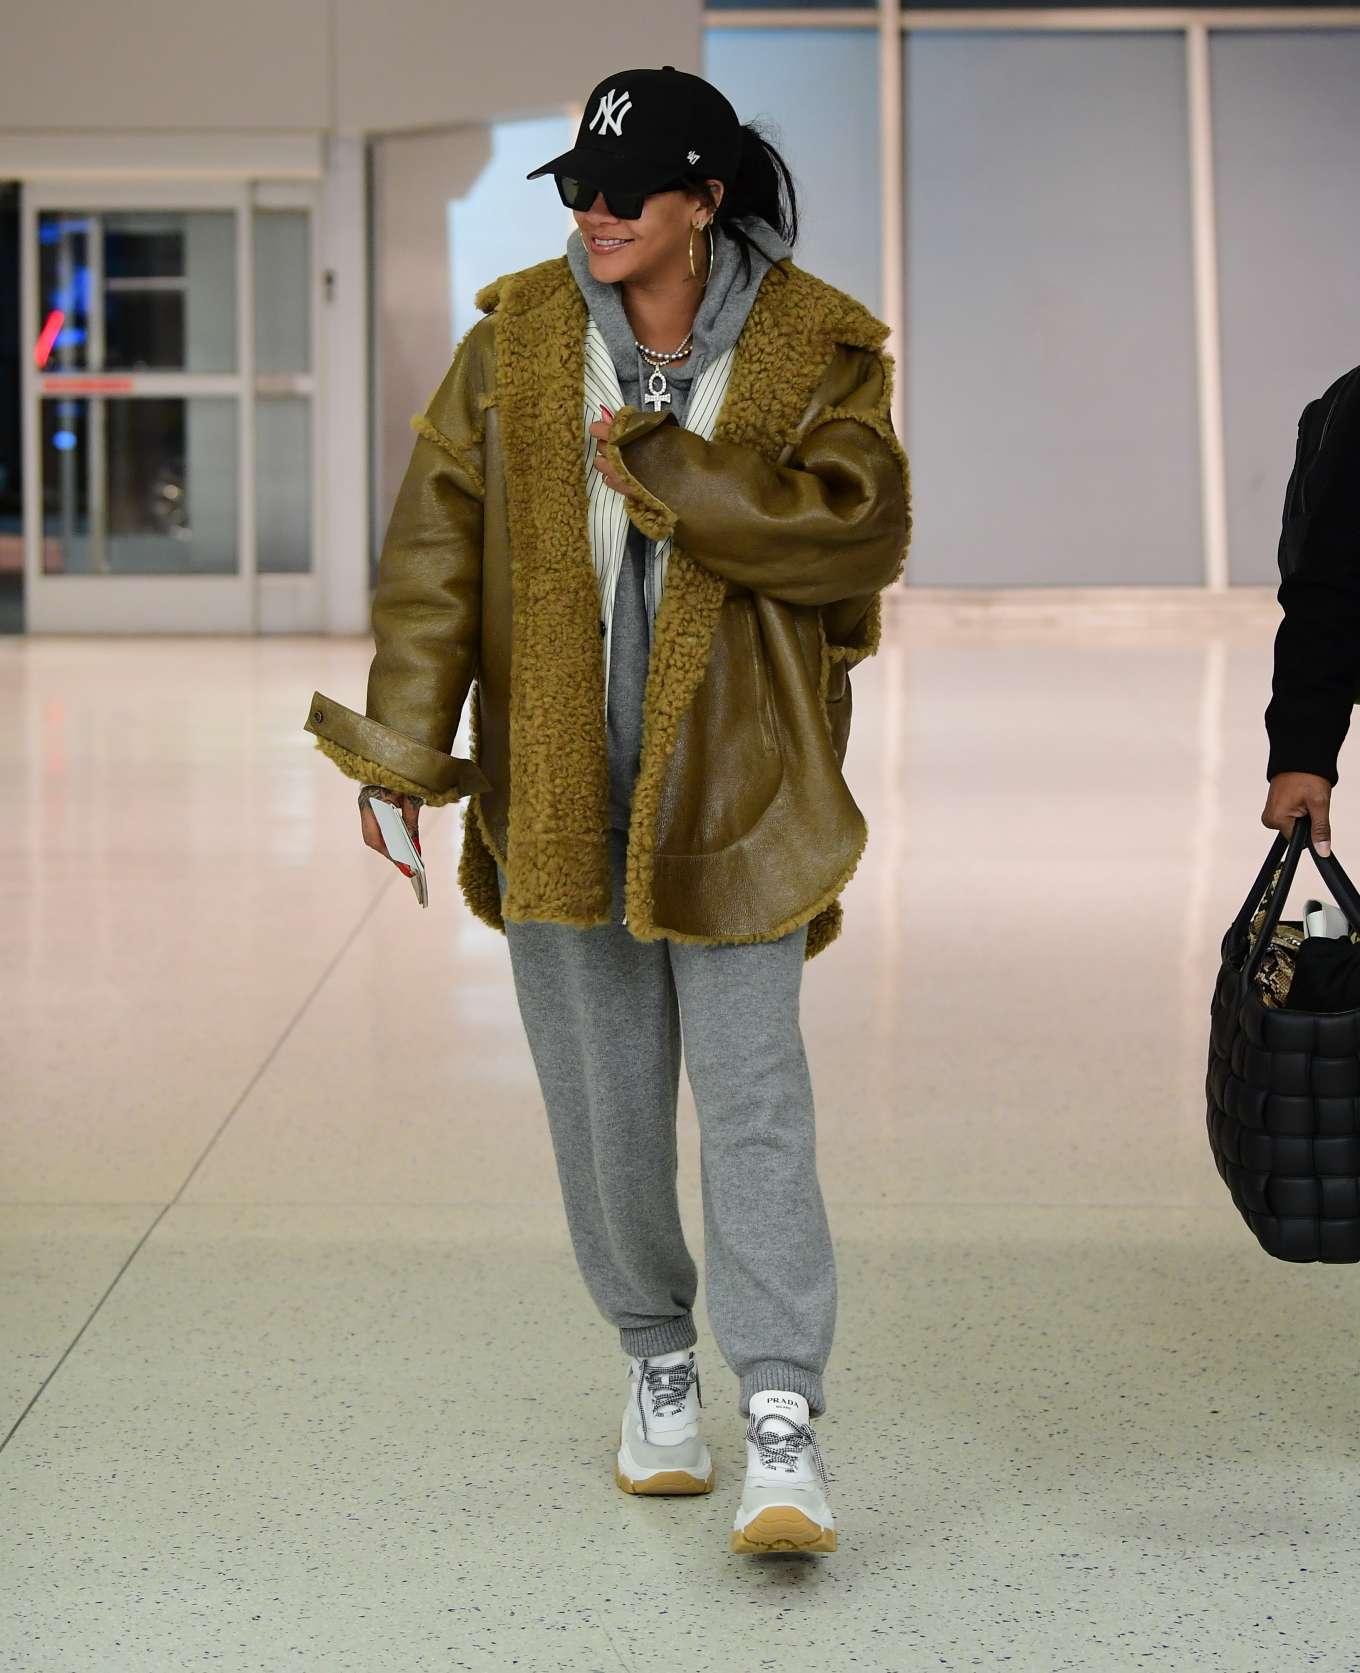 Rihanna rocking white mustard lace-up trainers